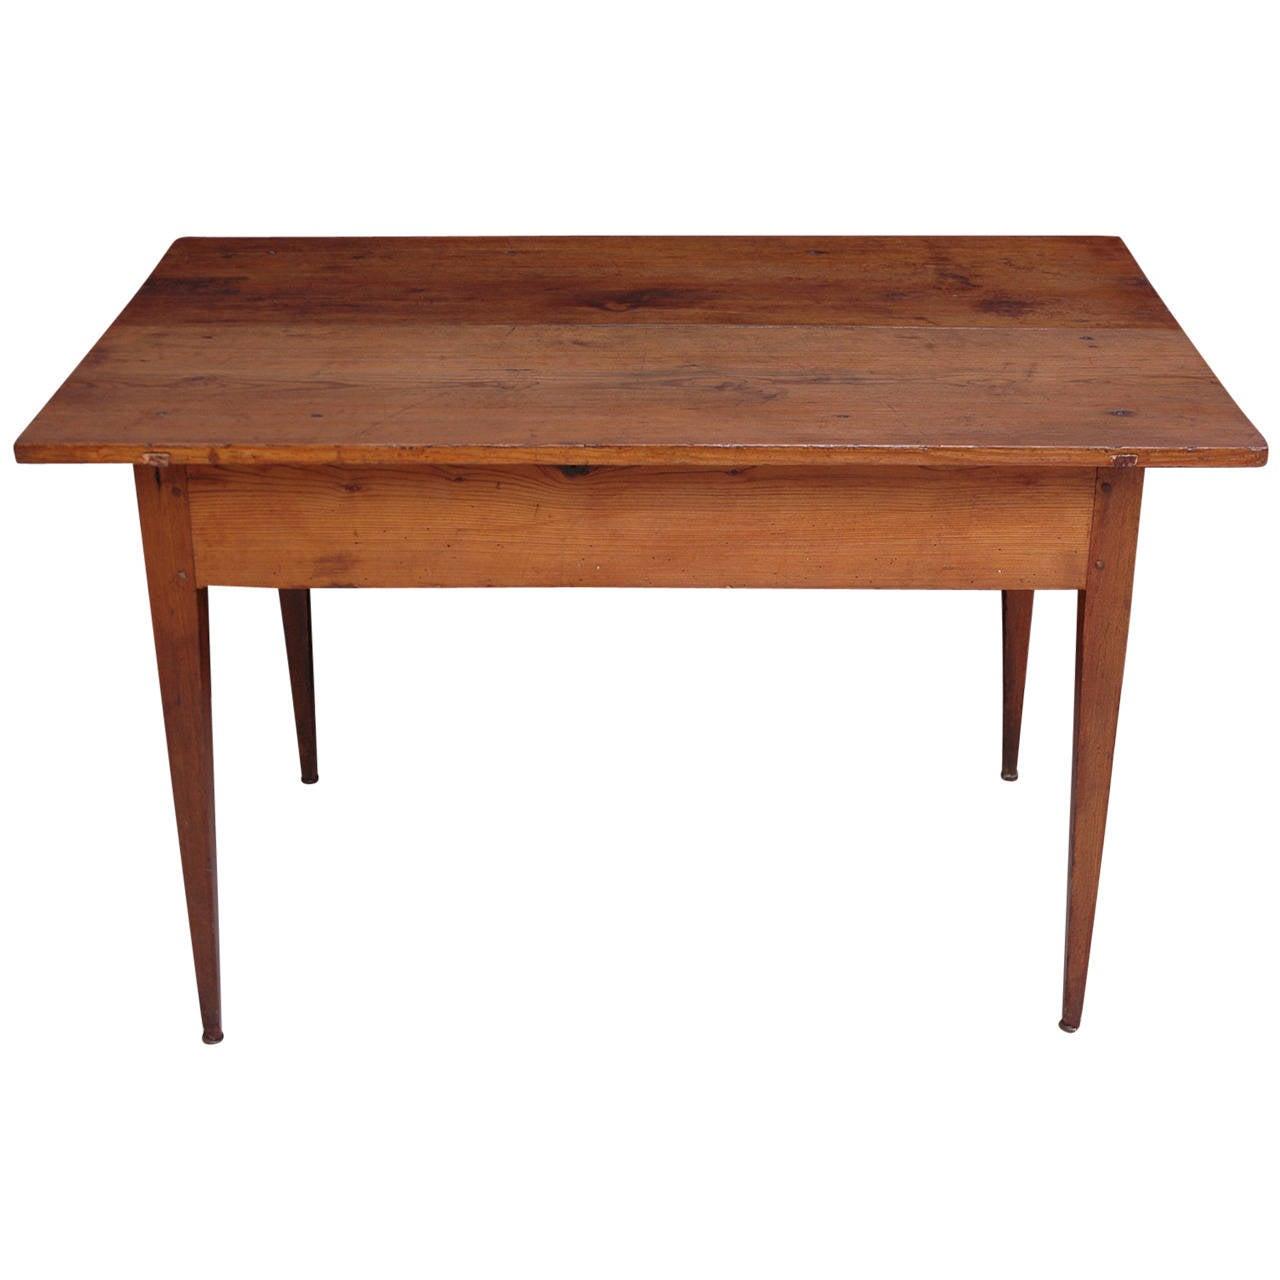 18th Century Pine Table